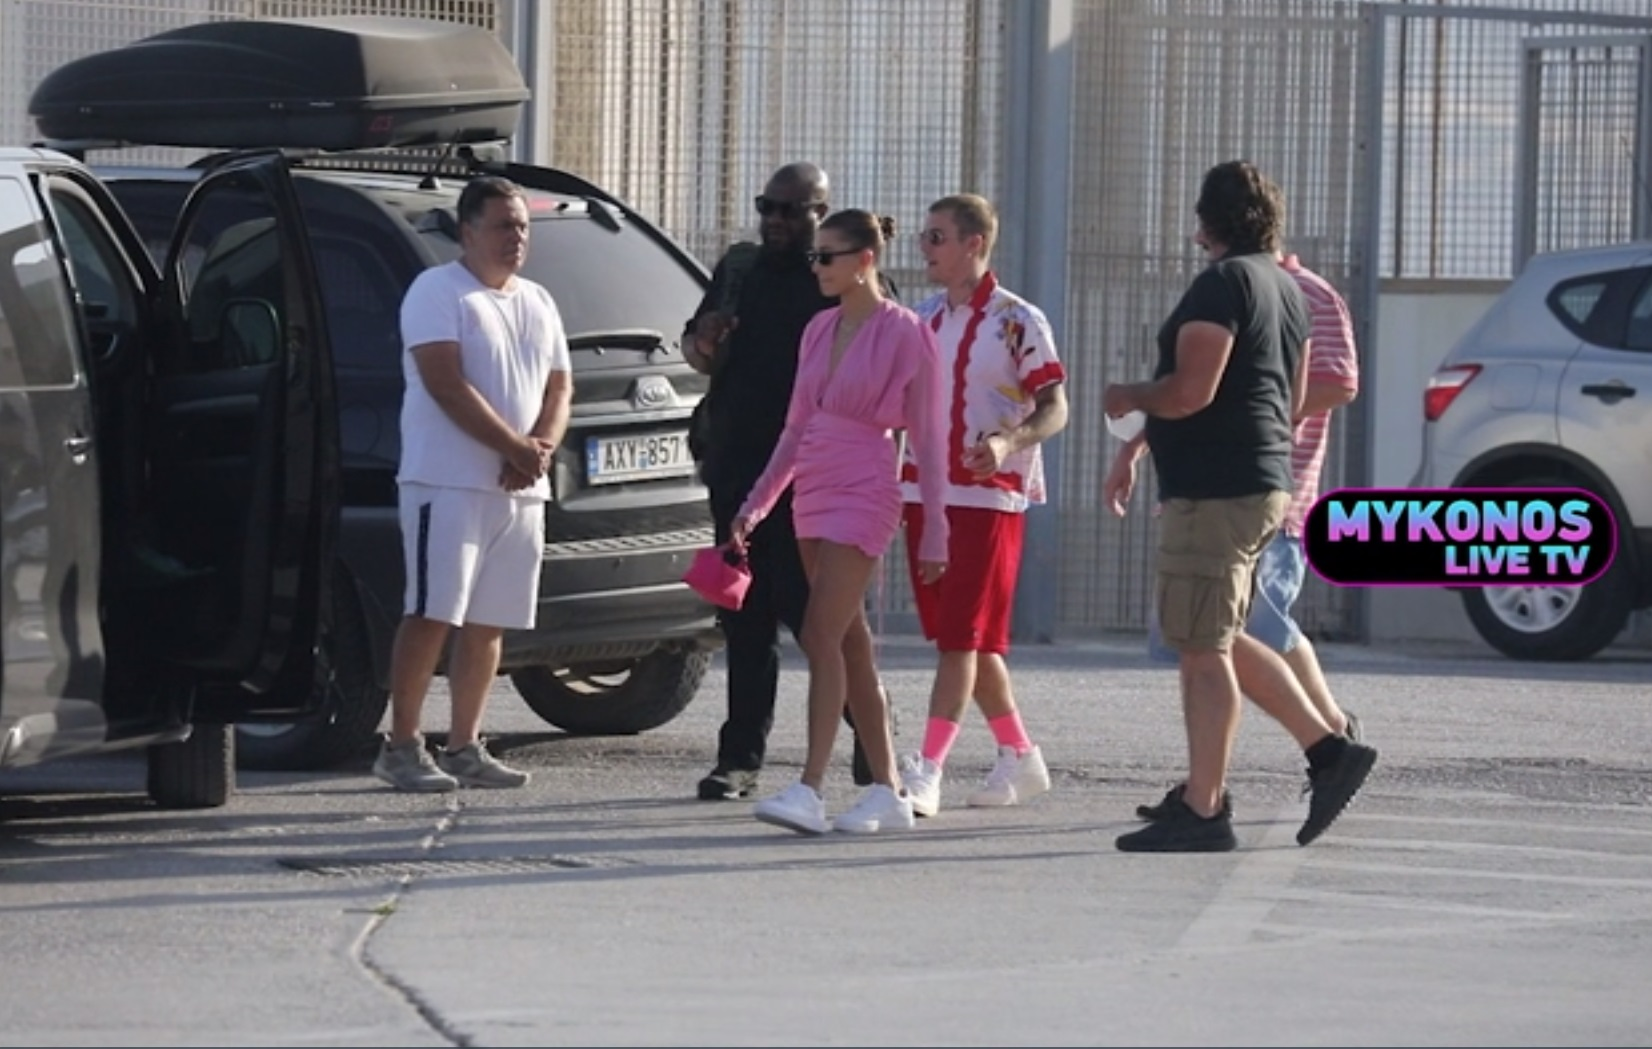 Justin Bieber: Πώς απολαμβάνει τις διακοπές του στα ελληνικά νησιά ο διάσημος τραγουδιστής (vid)